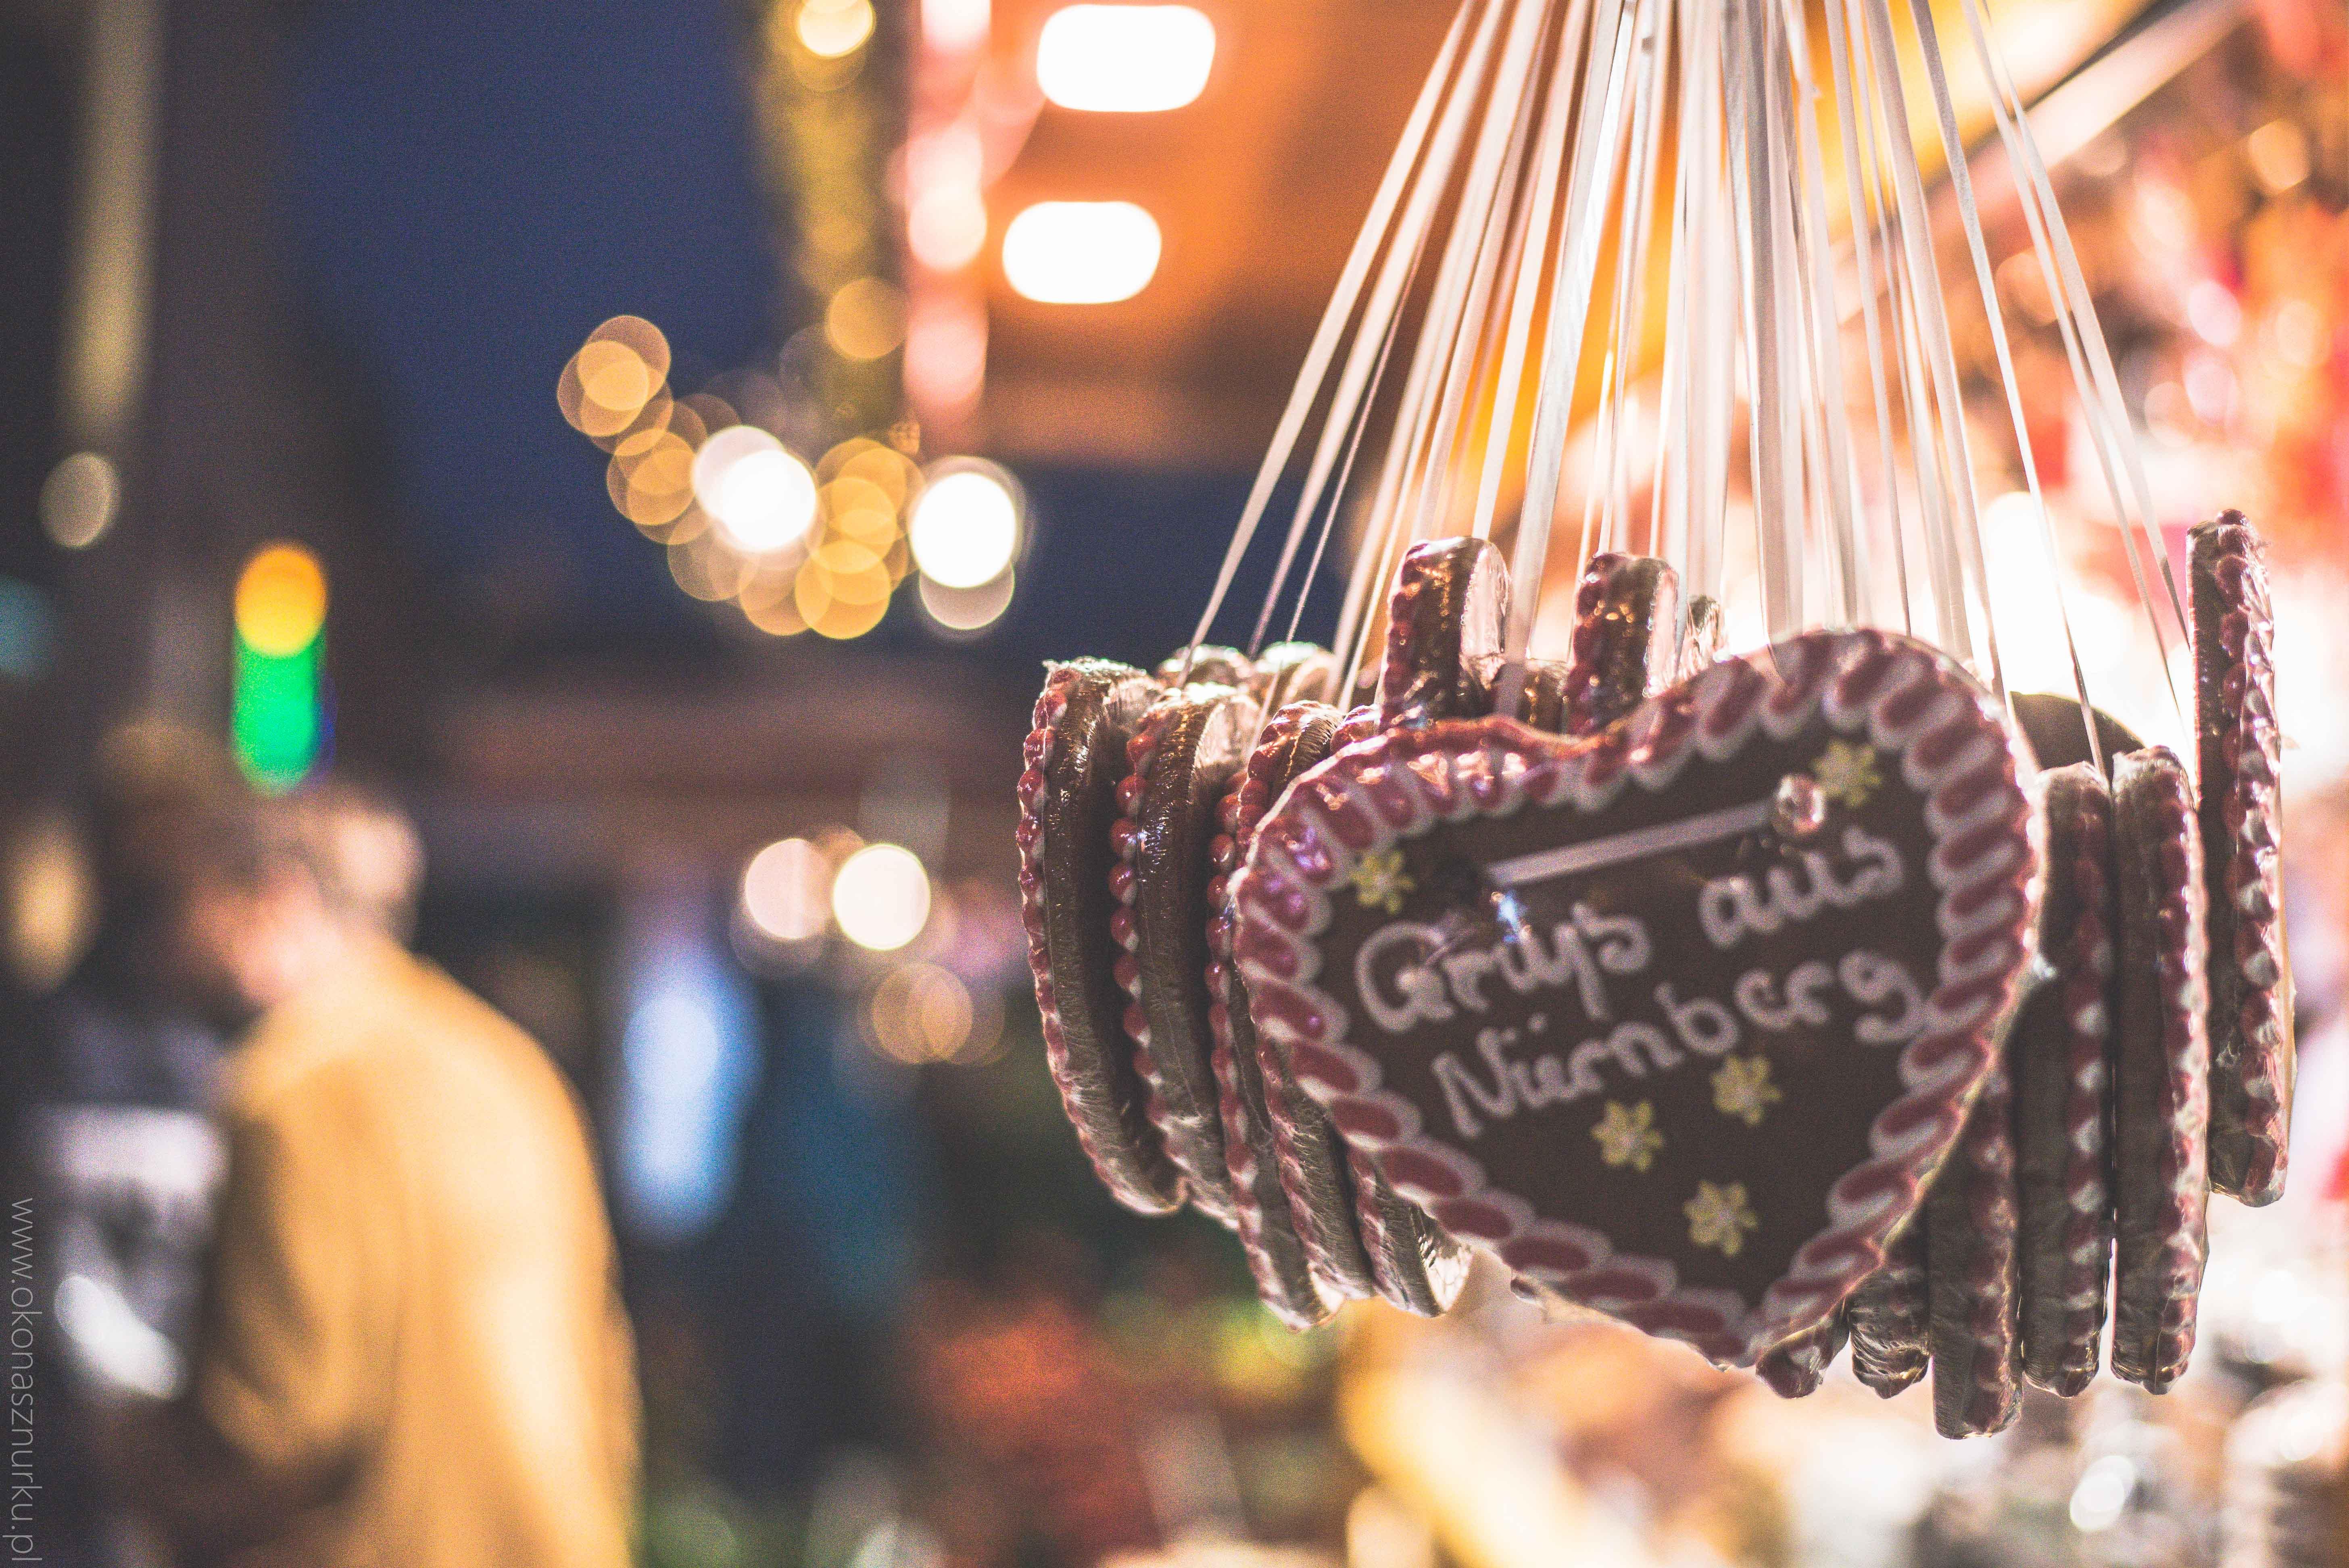 norymberga-weihnachtsmarkt-christmas-market-nurnberg (7)